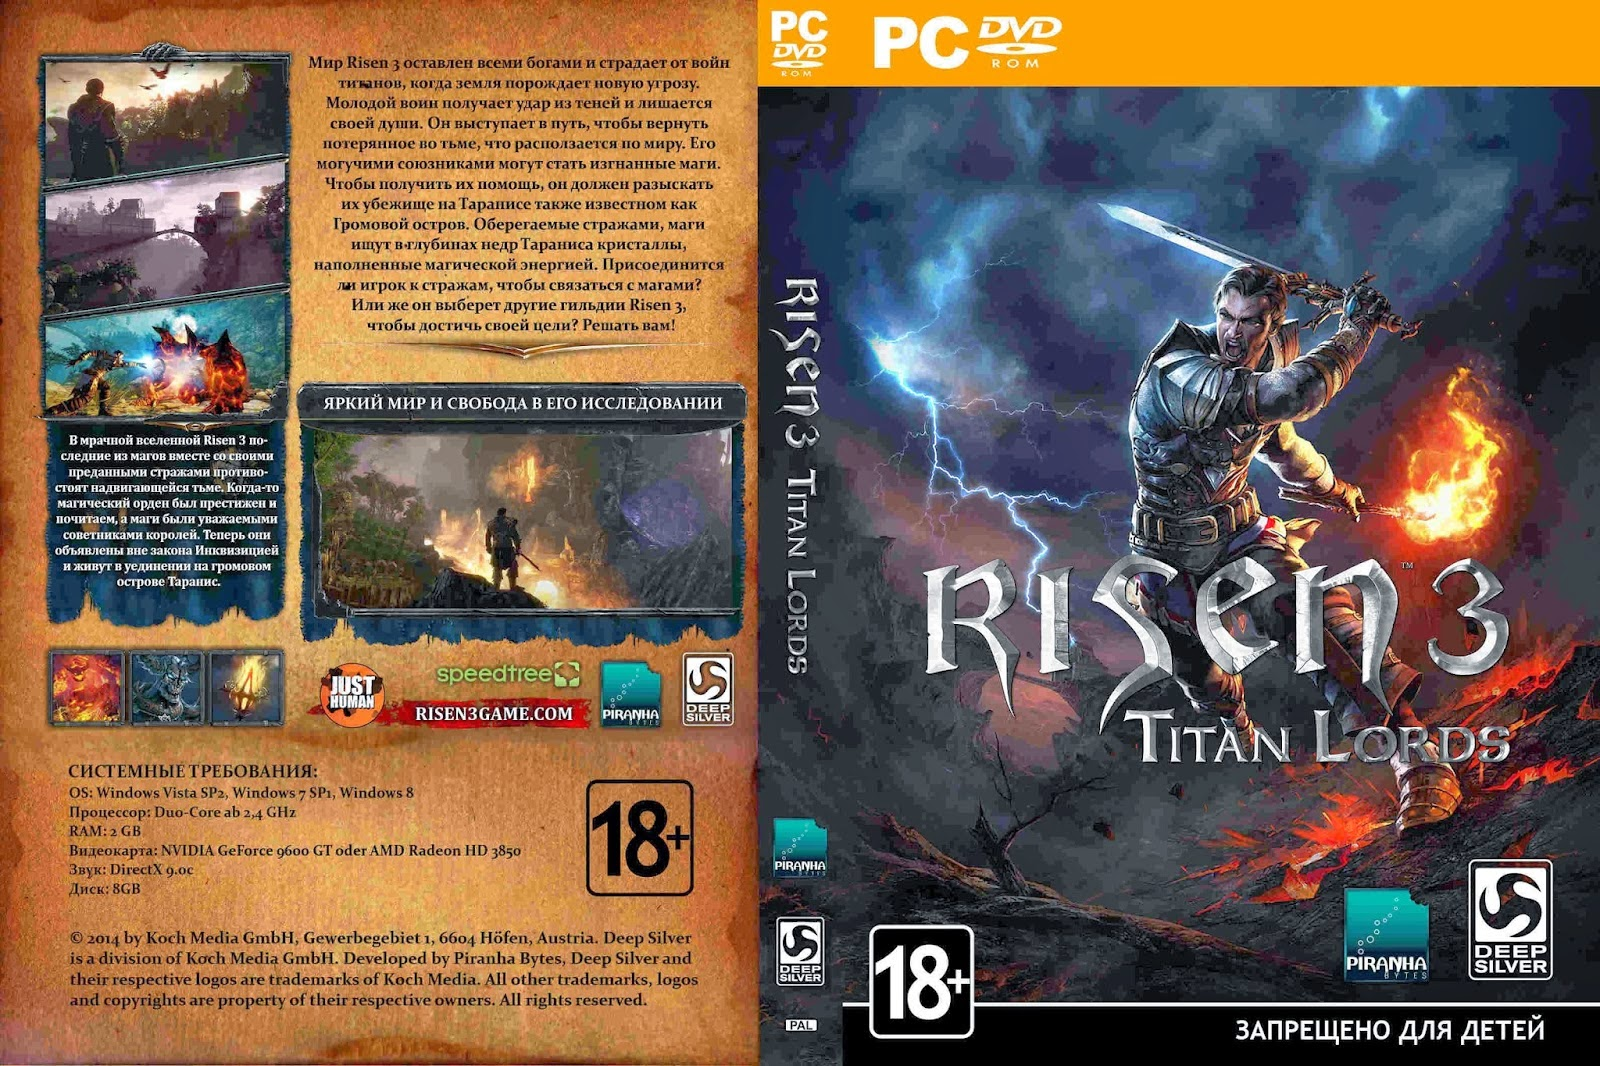 Risen 3 Titan Lords imagens